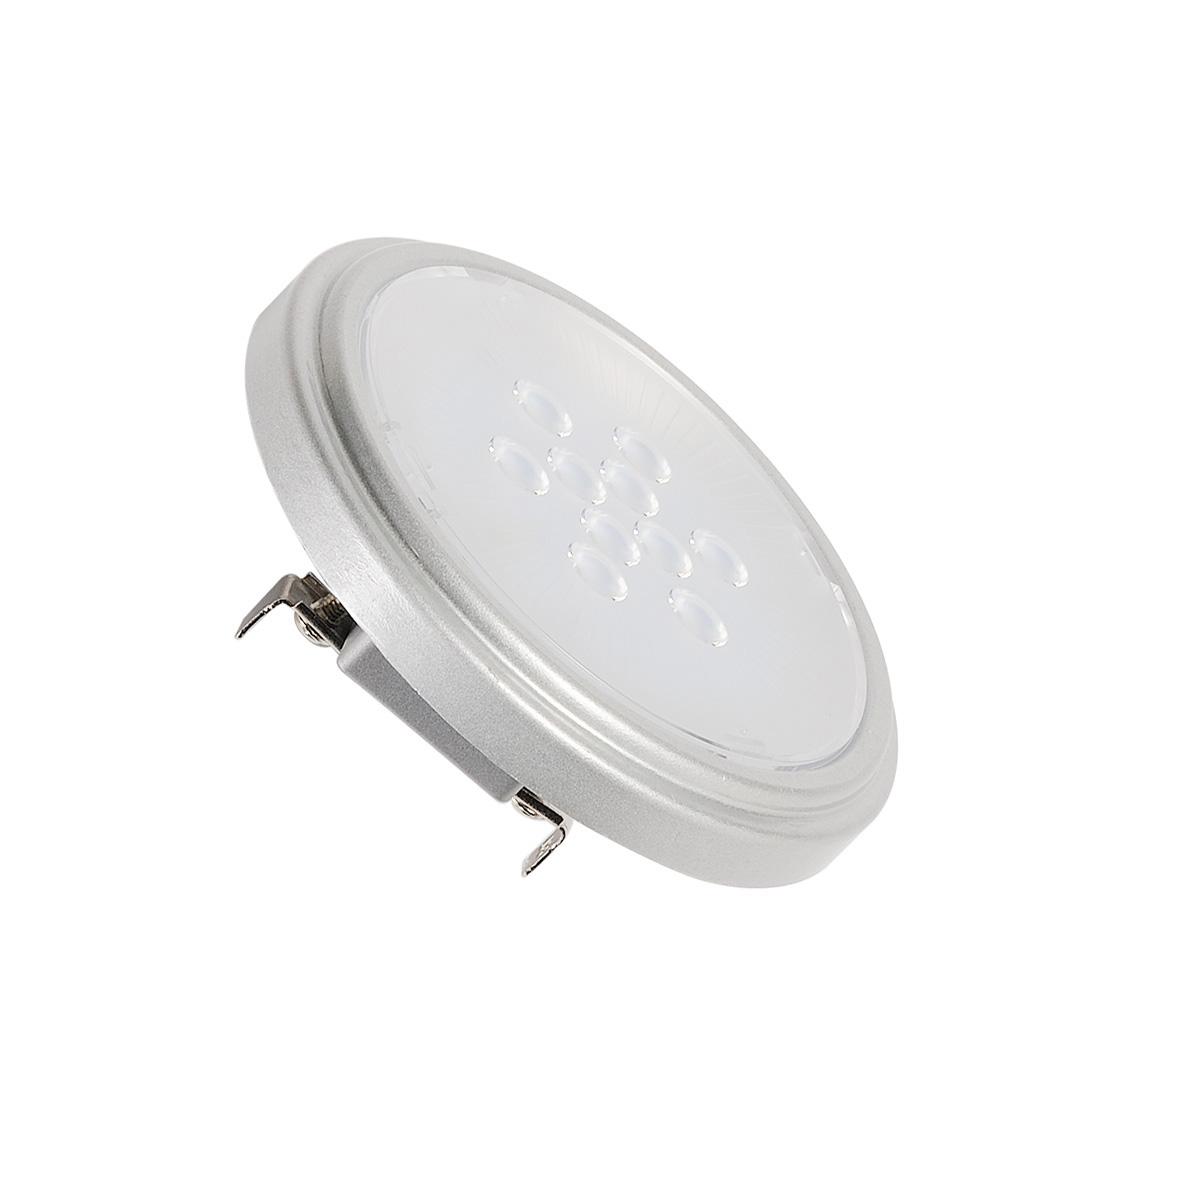 1 Stk QR111 Retrofit LED Leuchtmittel, G53, 4000K, 40°, silbergrau LI560664--